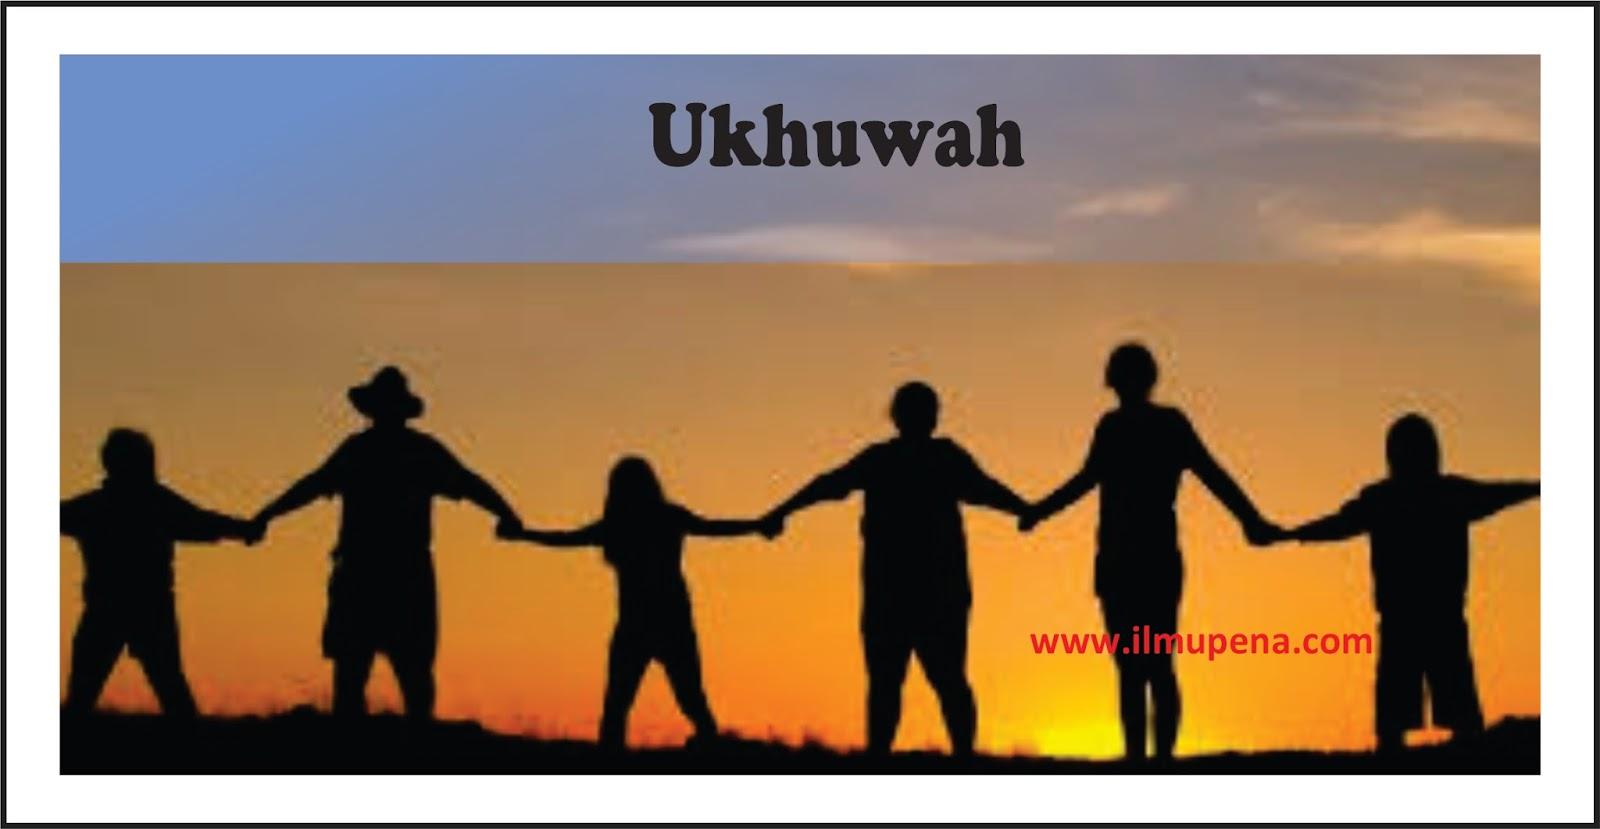 Pengertian Ukhuwah Macam Macam Ukhuwah Dan Manfaat Ukhuwah Ilmupena Com